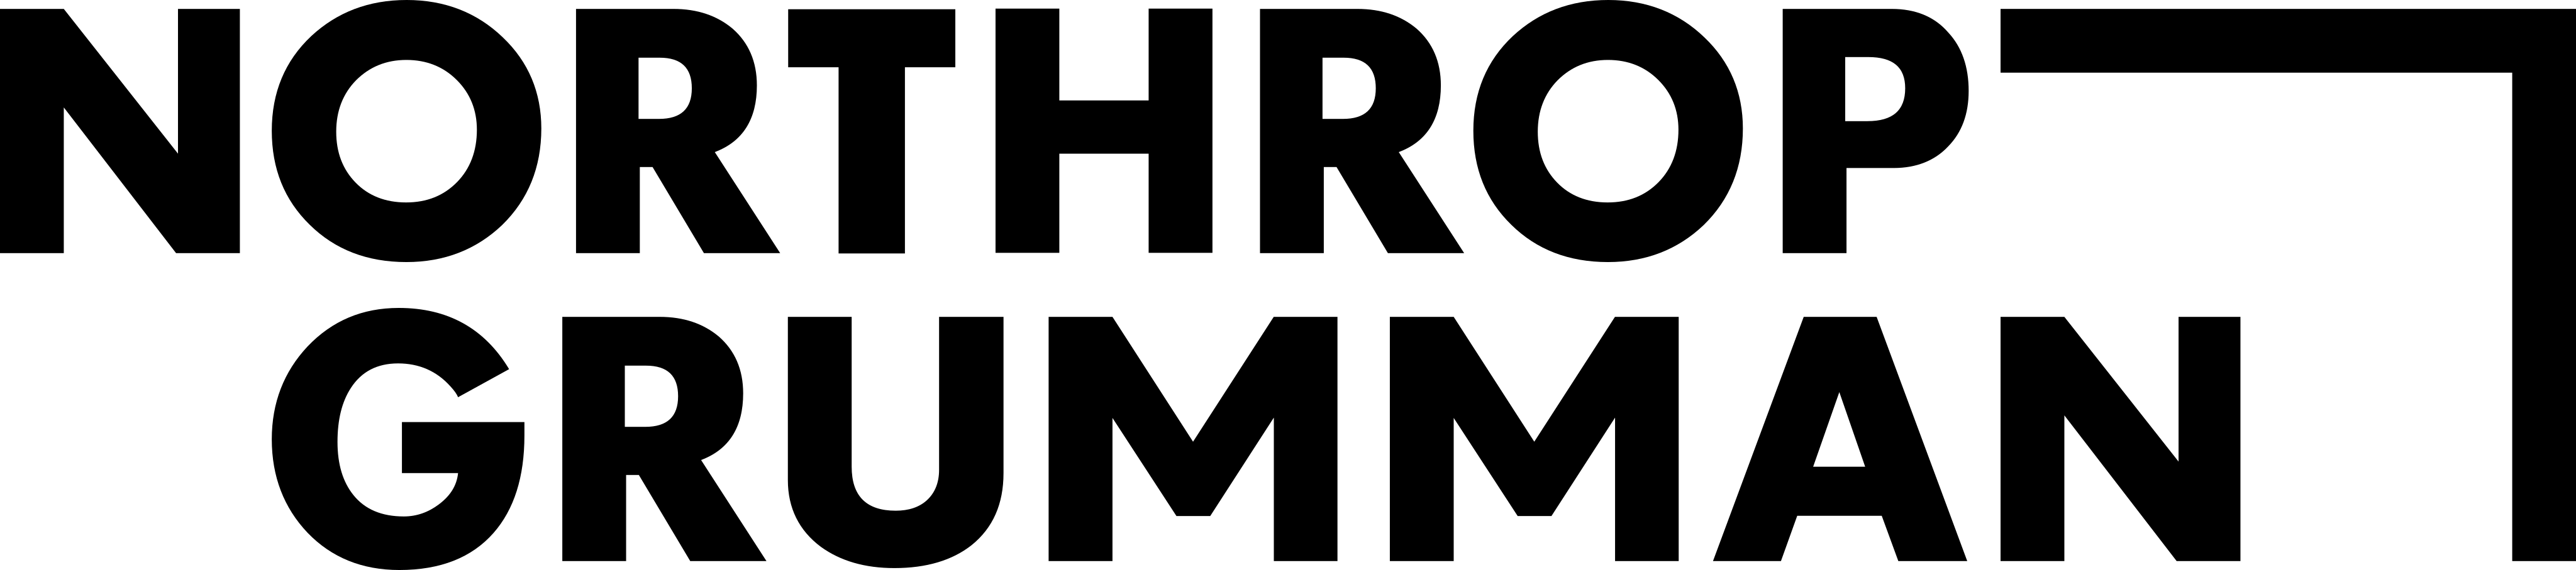 northrop grumman logo - Northrop Grumman Logo